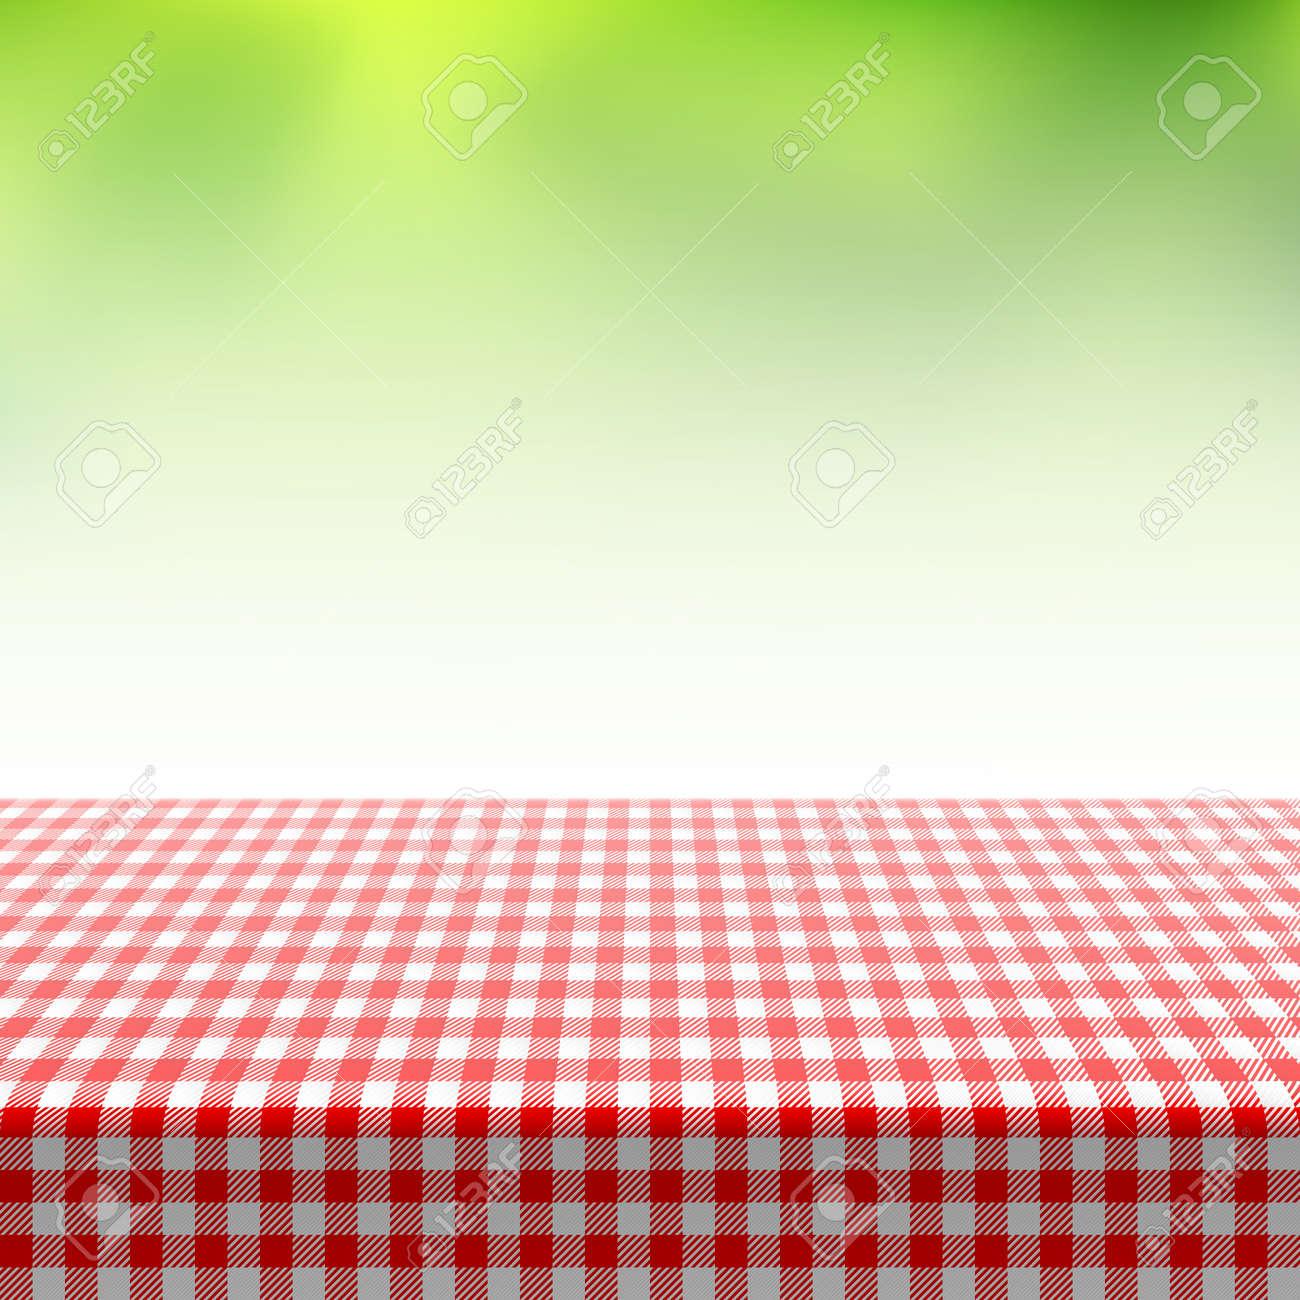 Picnic table background - Picnic Table Background